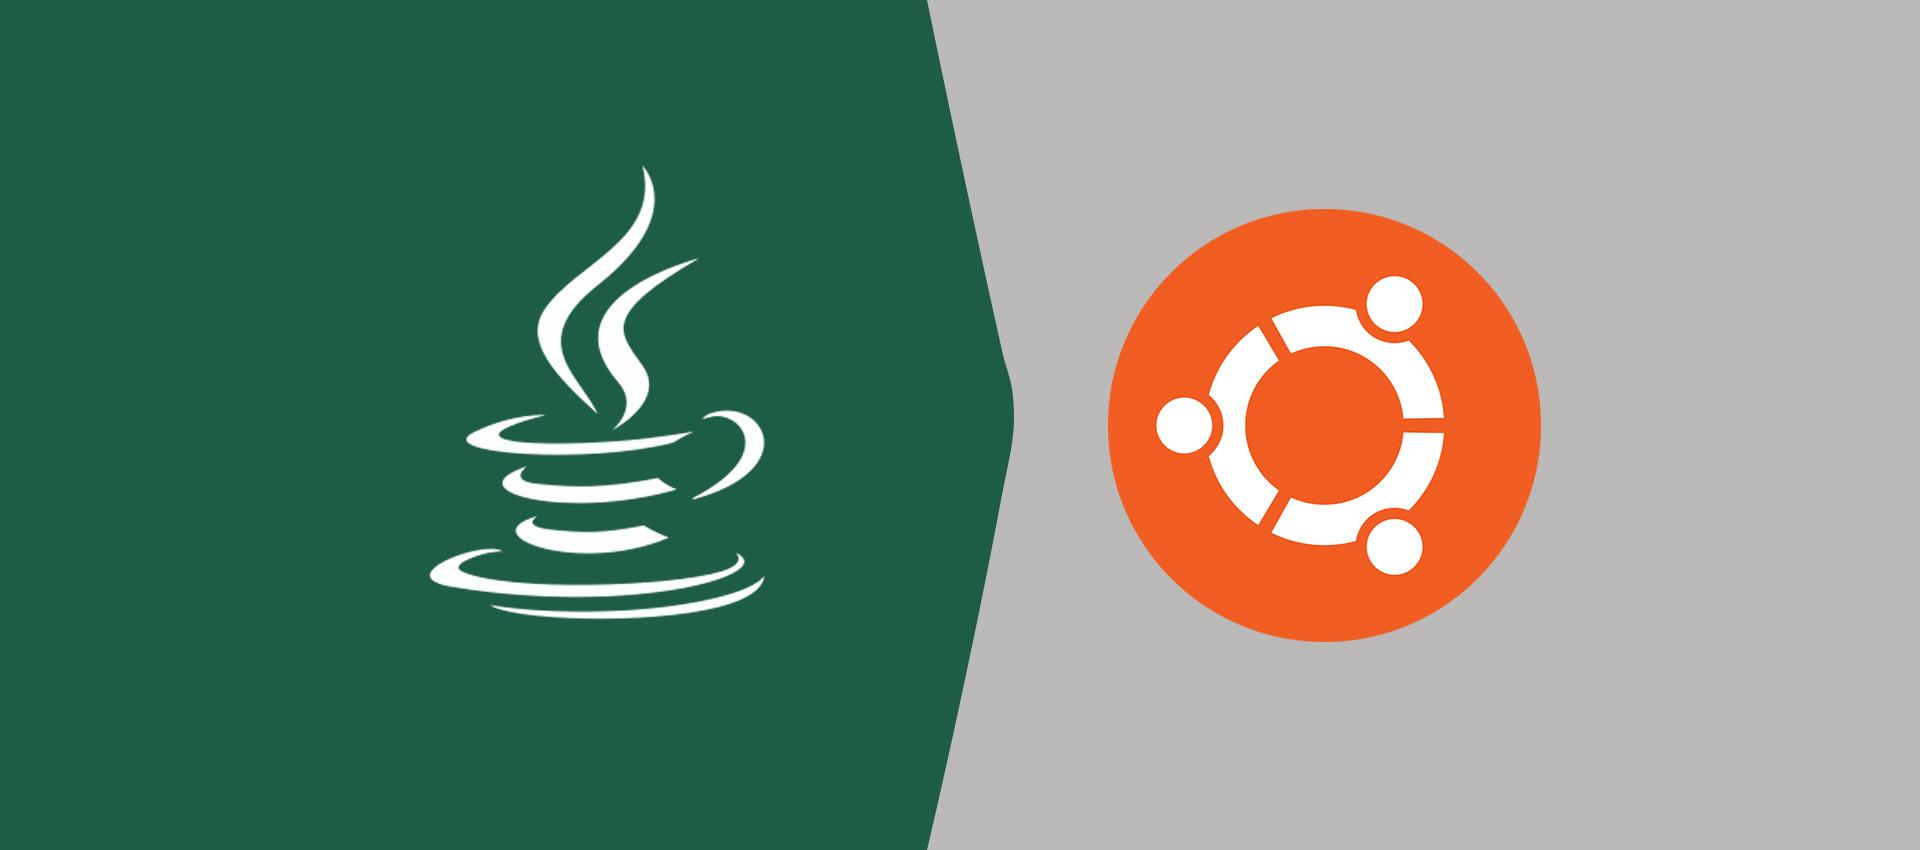 How To Install Java 16 On Ubuntu 20.04 LTS